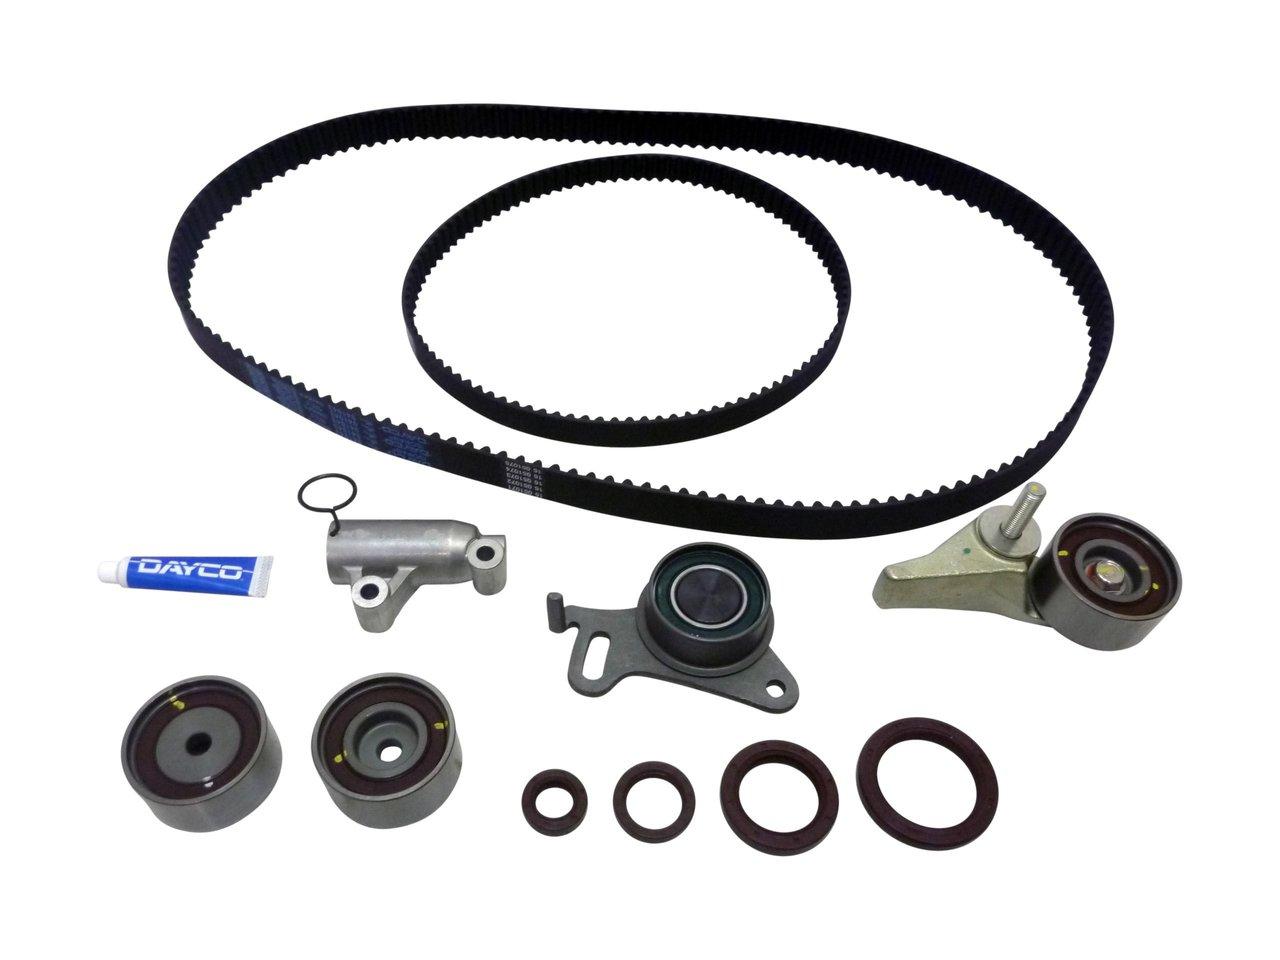 Mitsubishi Timing Belt : Timing belt kit for mitsubishi triton challenger turbo